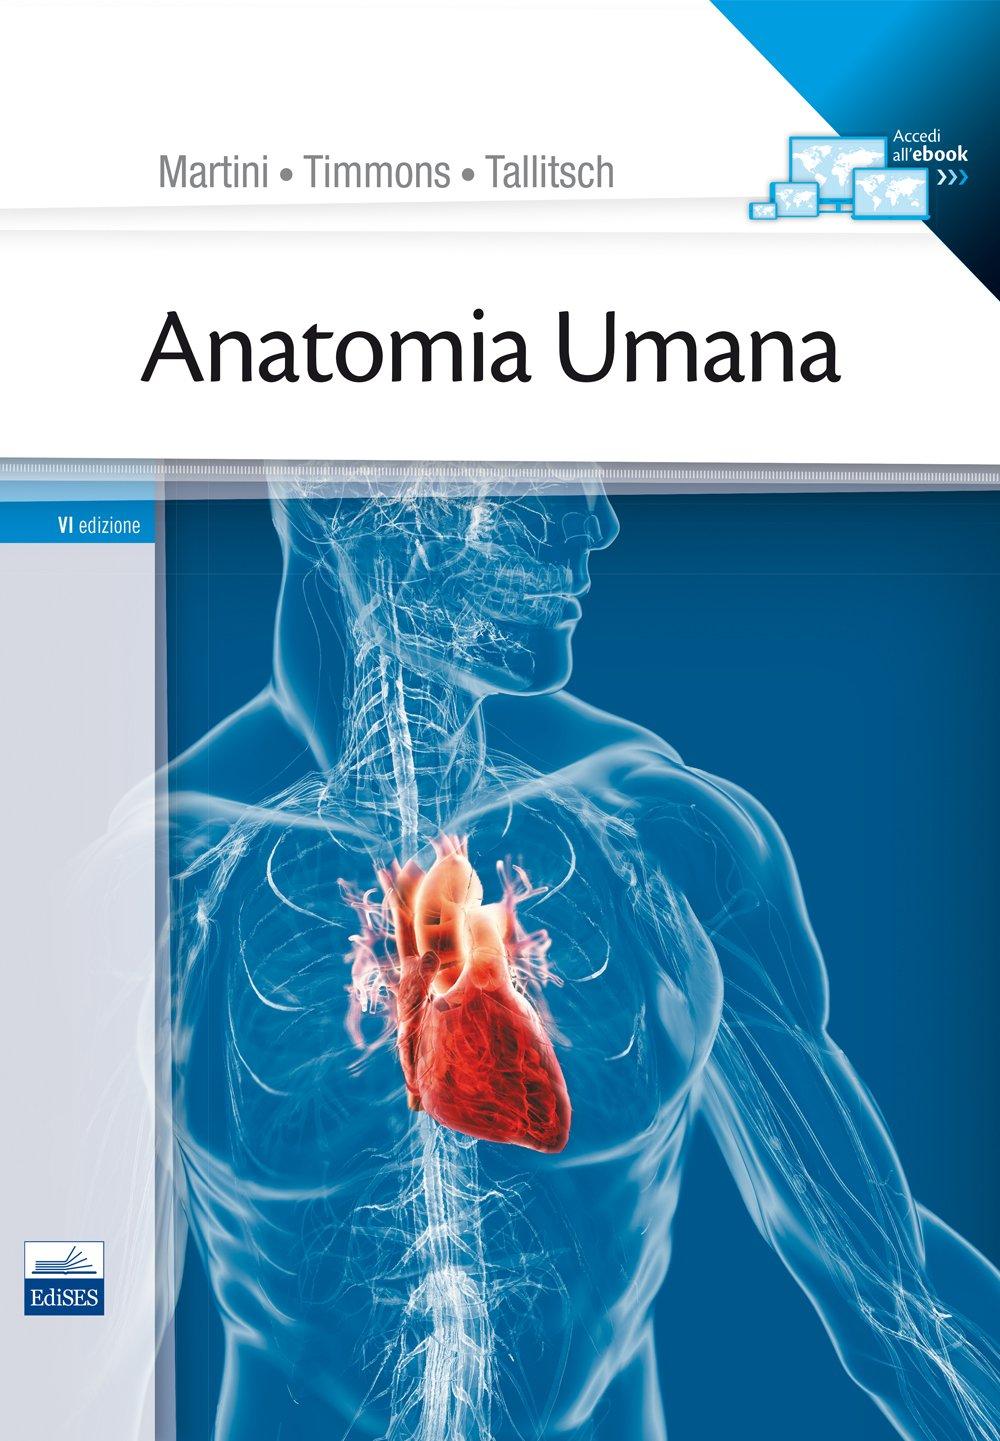 Anatomia umana: Amazon.it: Frederic H. Martini, Michael J. Timmons ...